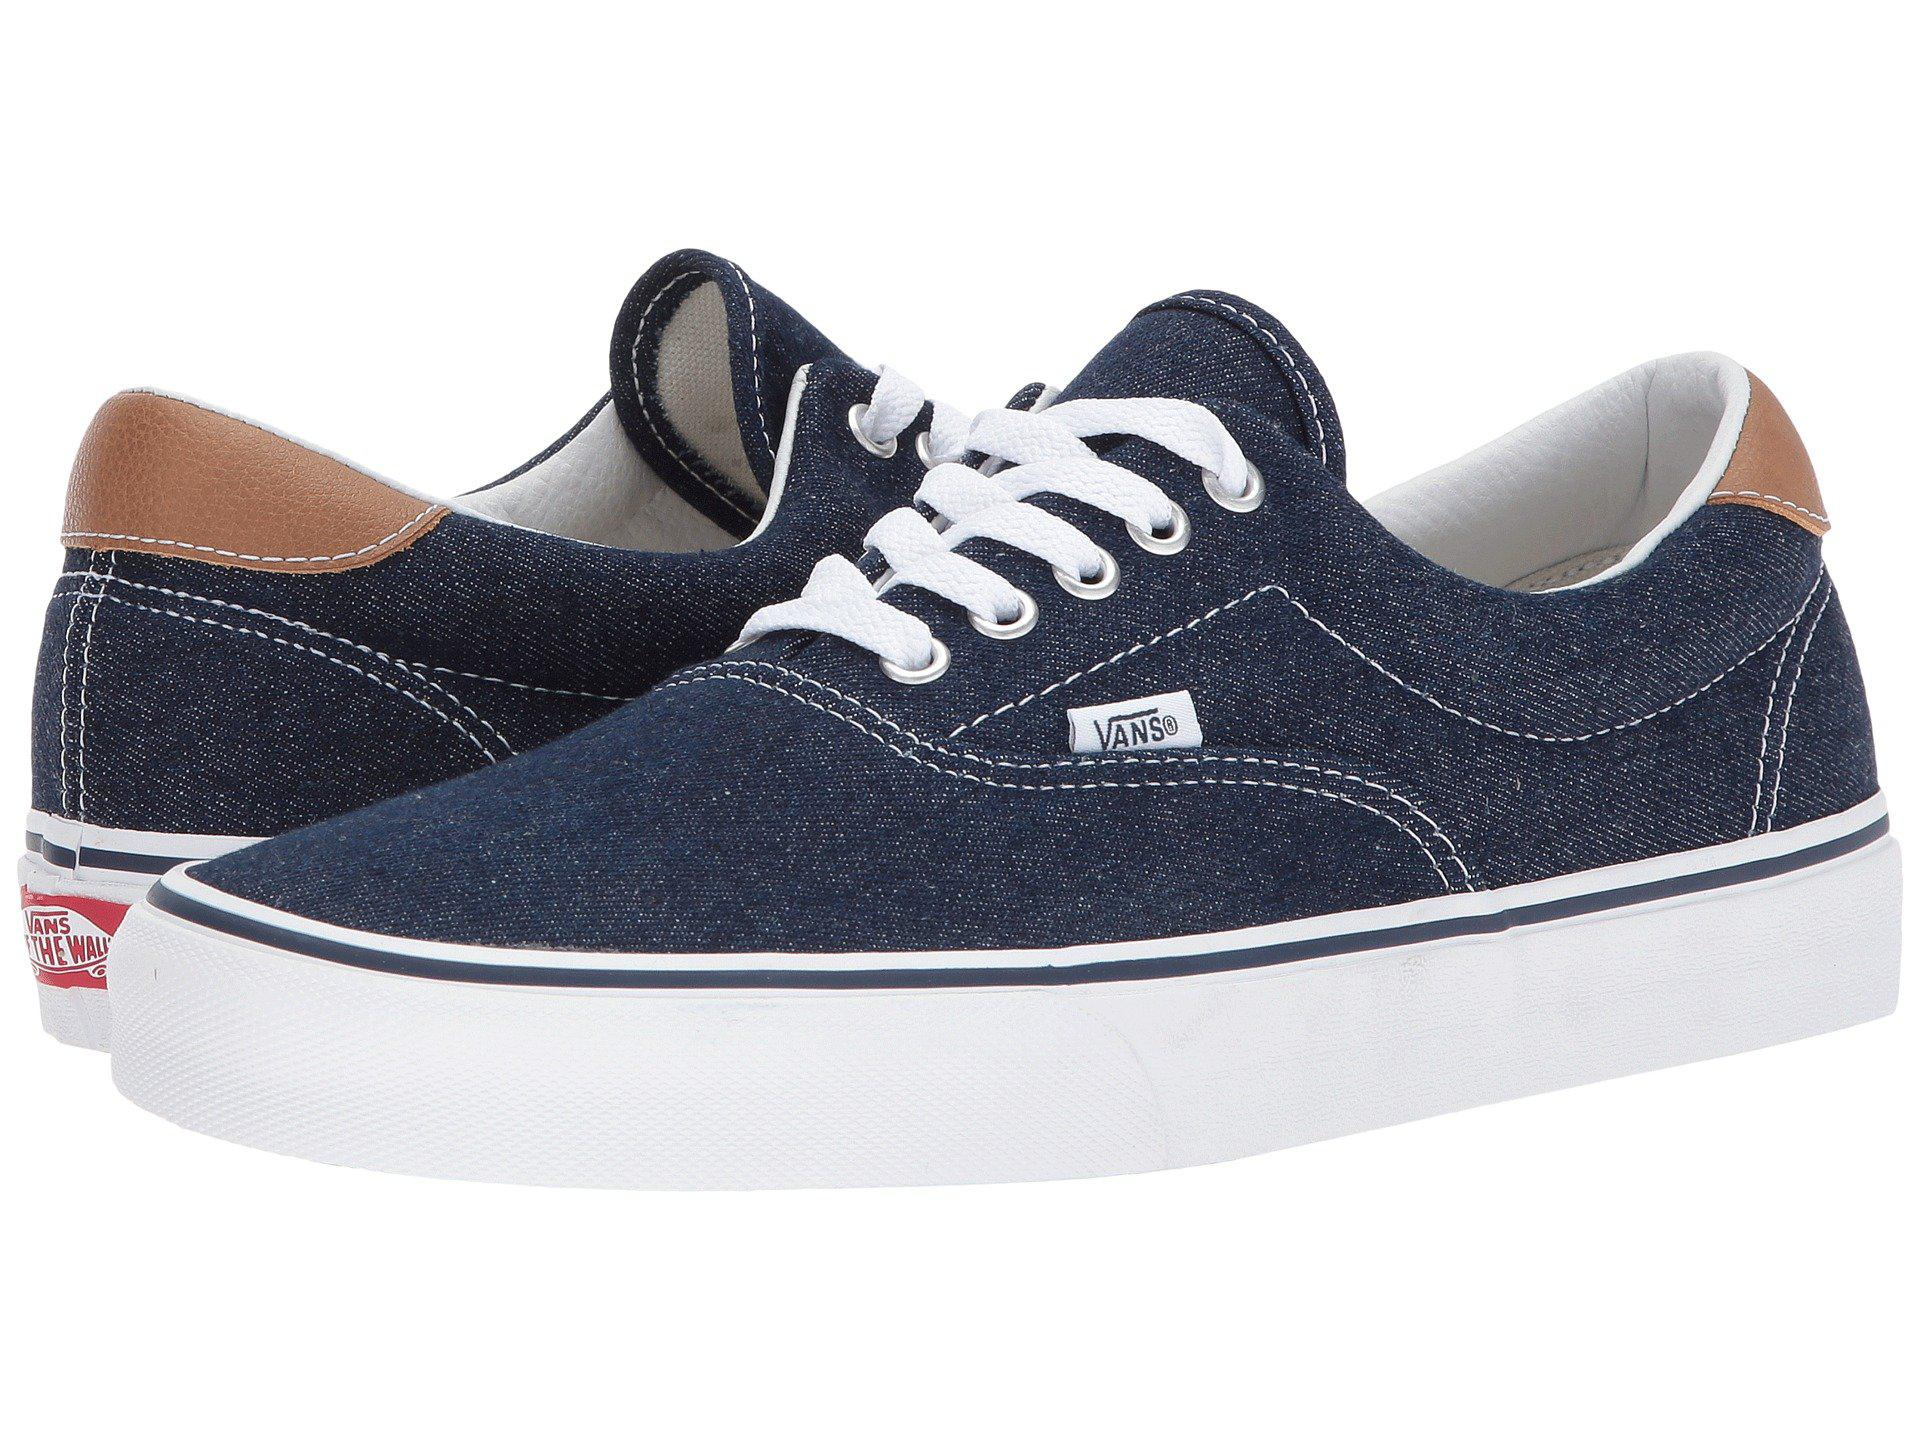 b18f9d45361370 Lyst - Vans Era 59 ((c l) Frost Gray acid Denim) Skate Shoes in Blue ...